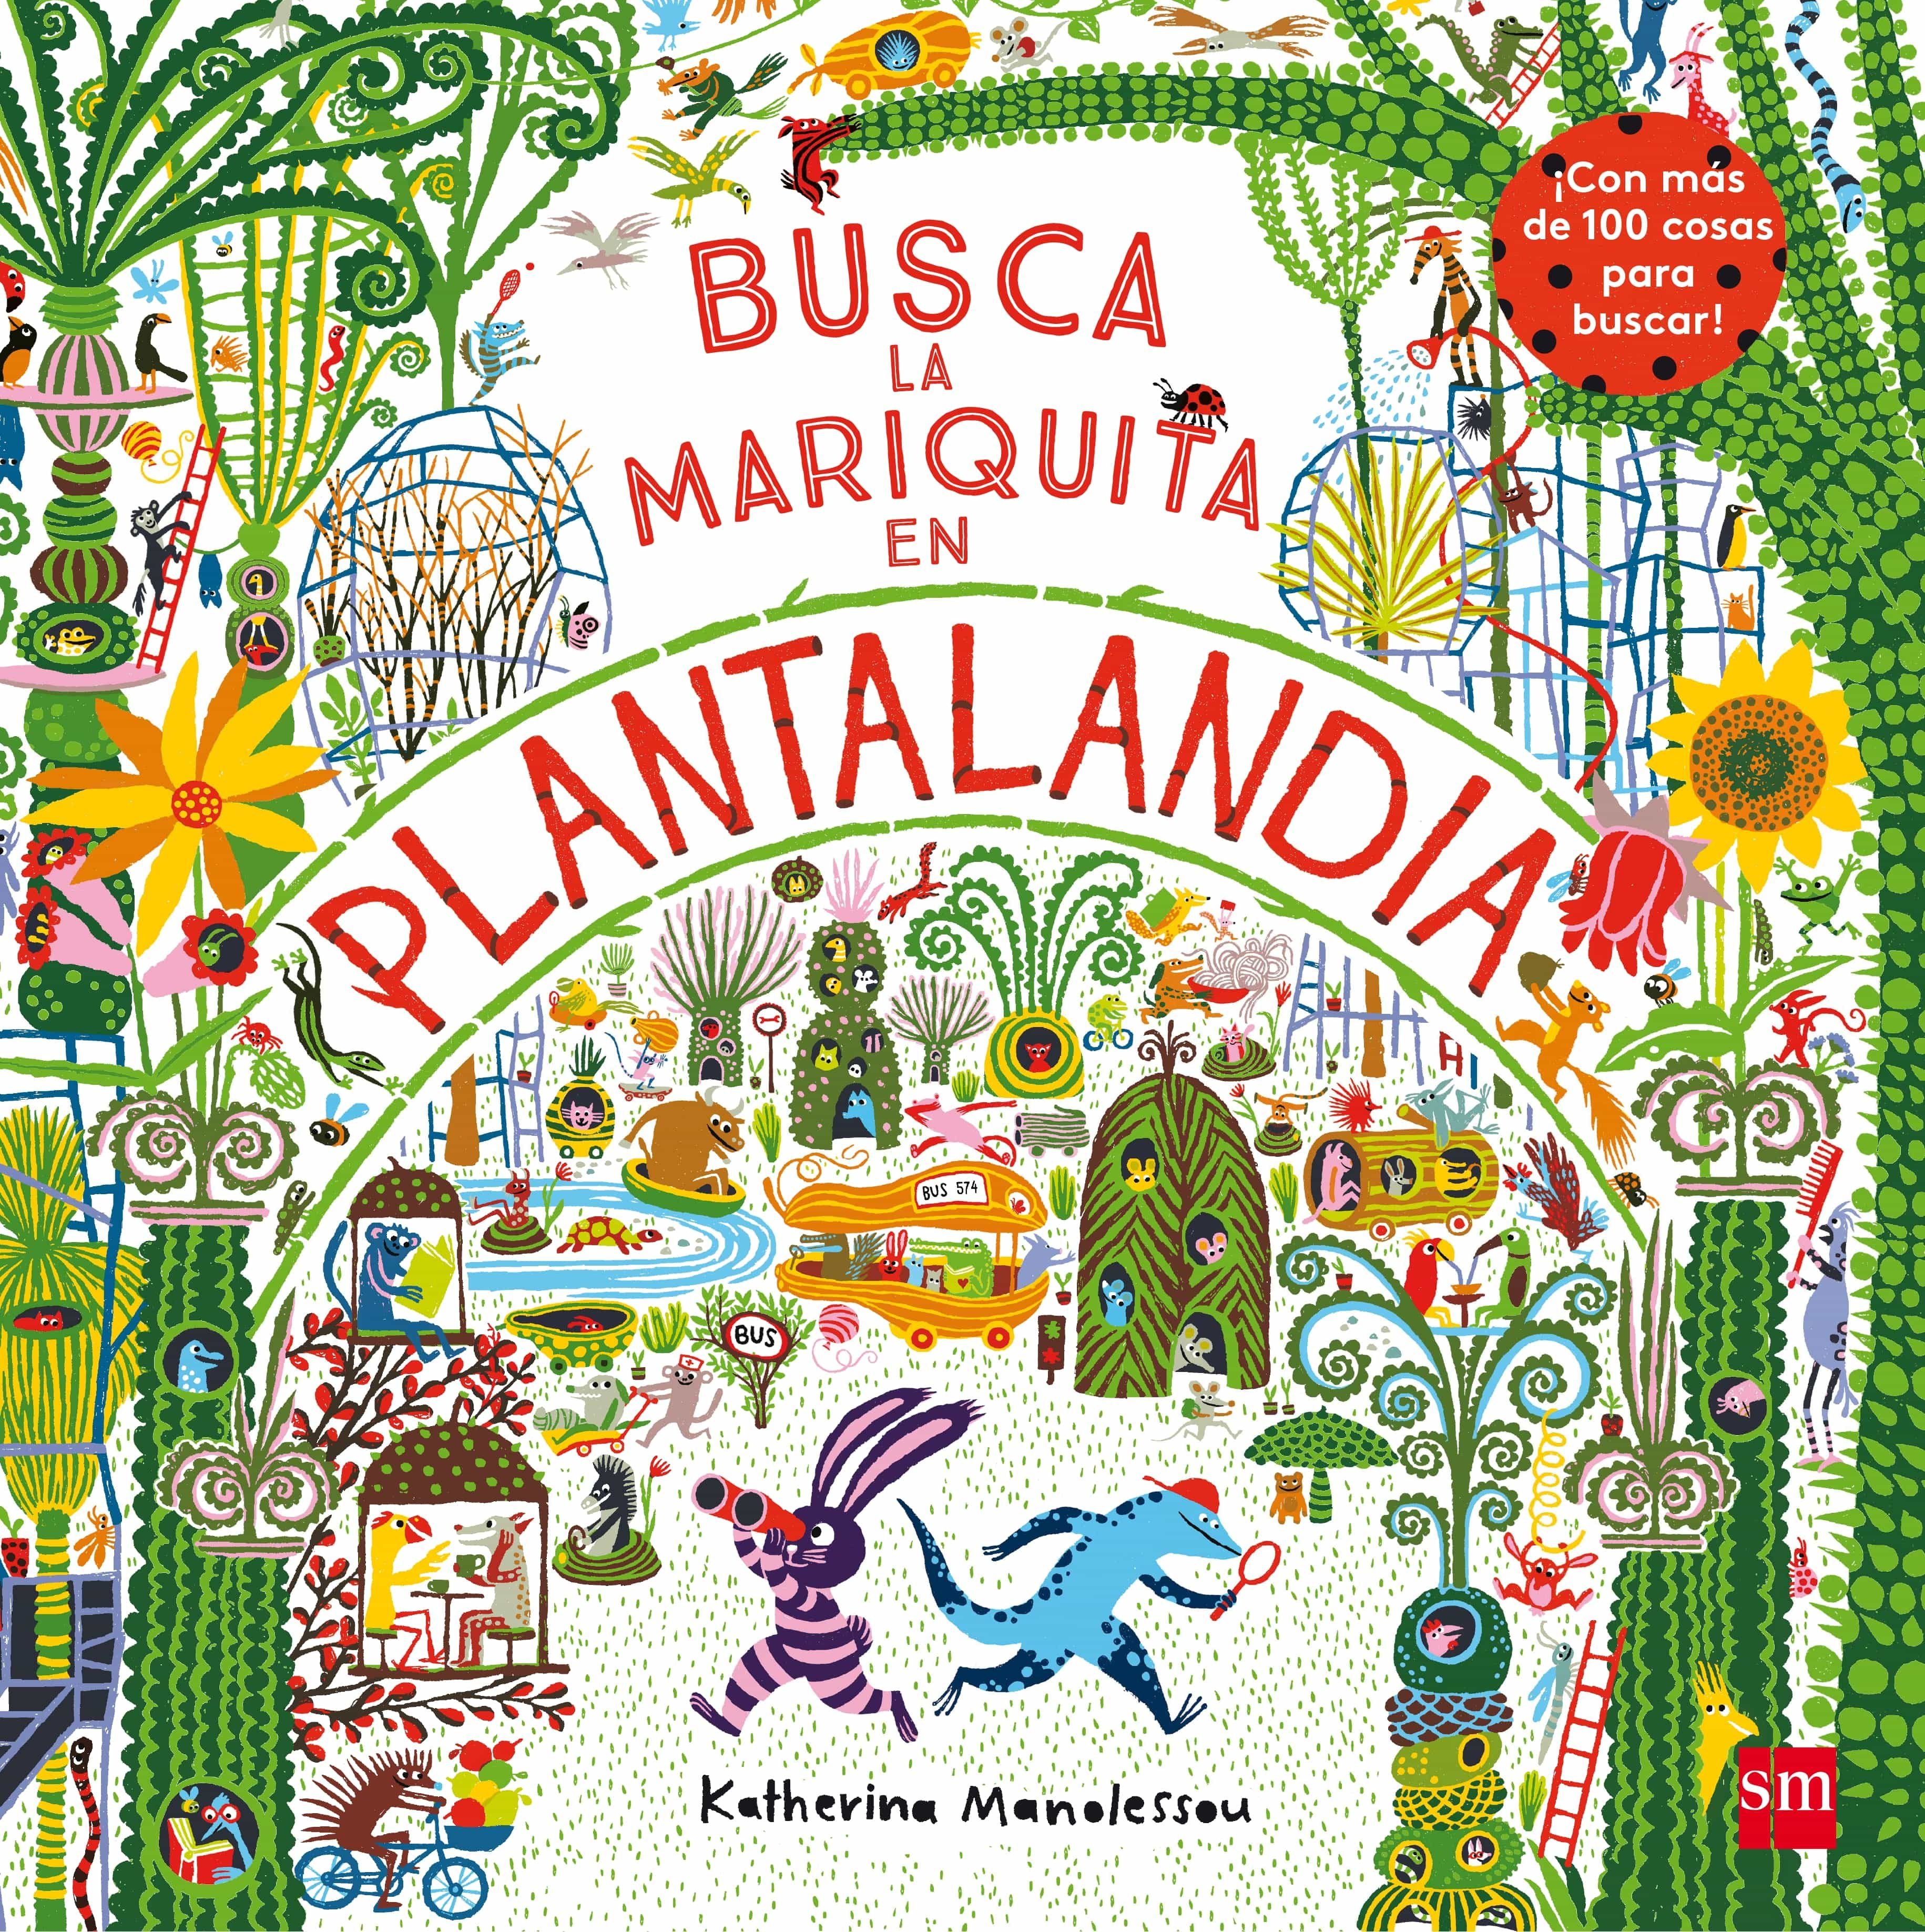 Busca La Mariquita En Plantalandia por Katherina Manolessou